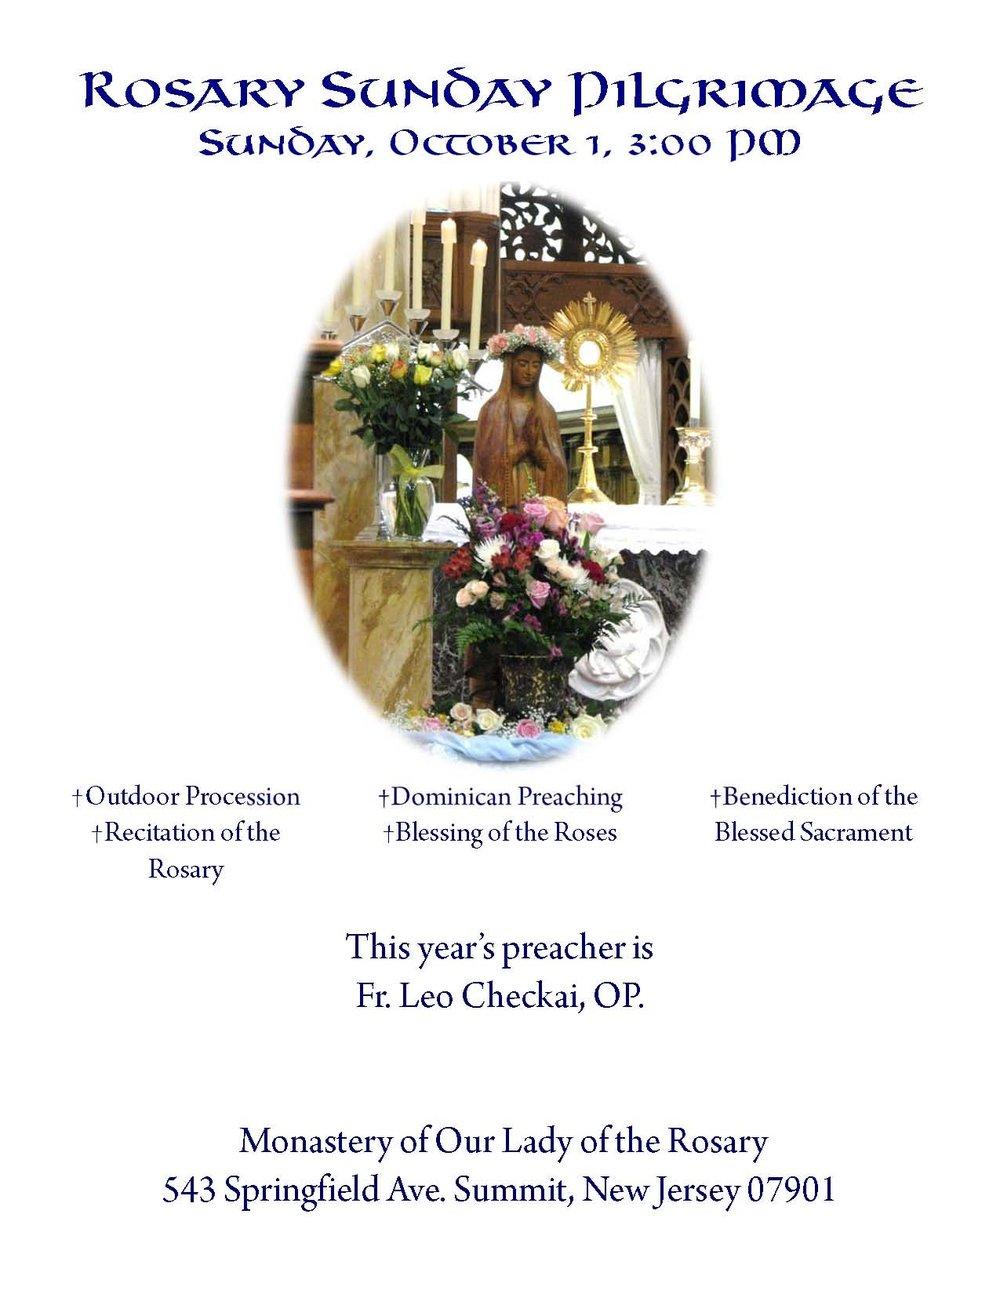 Rosary Pilgrimage Oct 2017.jpg